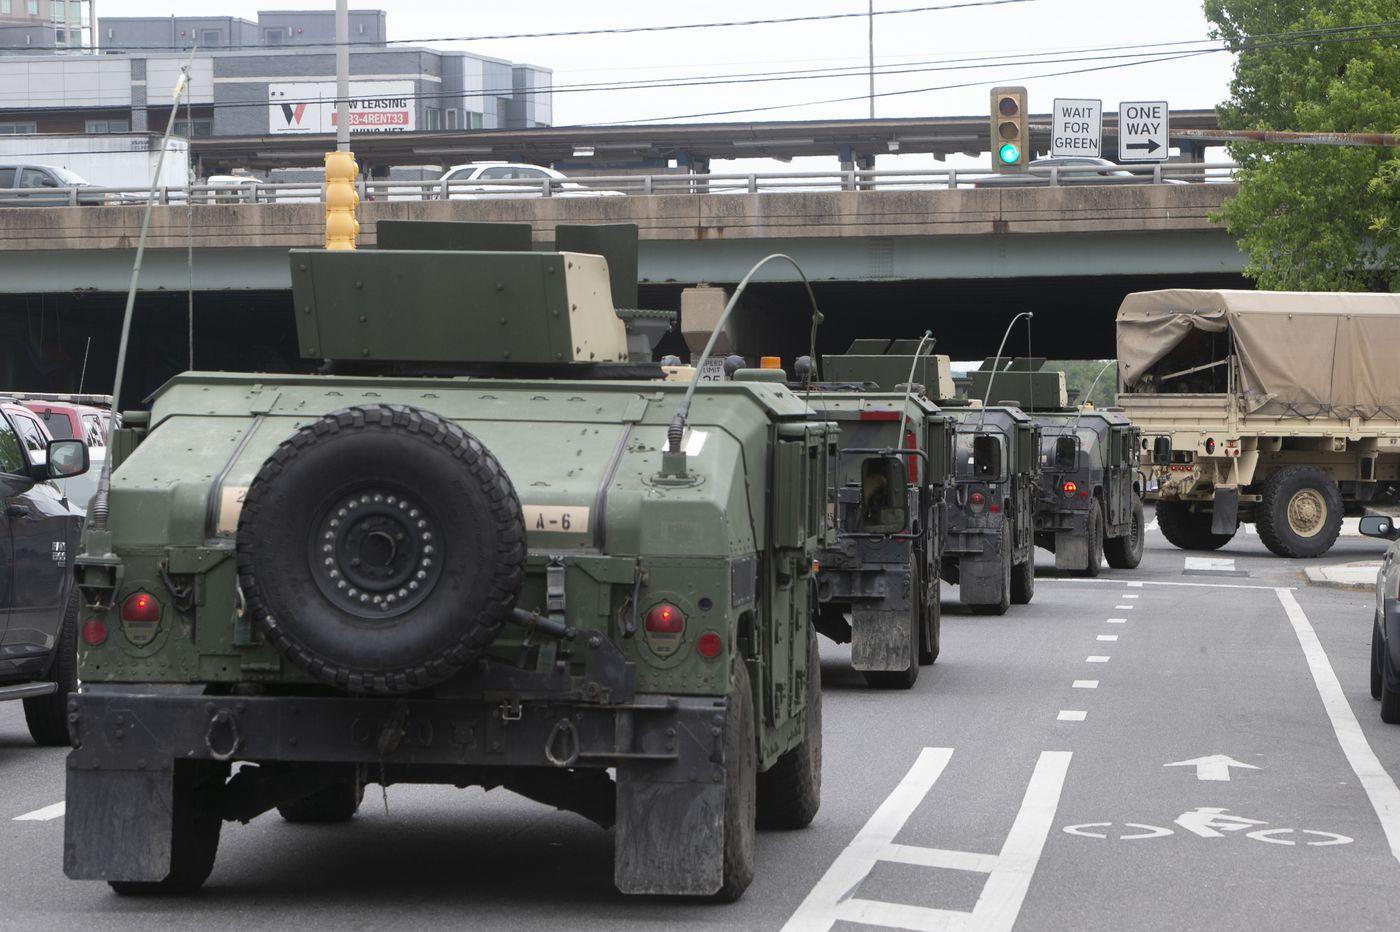 Pa. sending 500 more National Guard troops to Philadelphia area in a messy scramble   Maria Panaritis